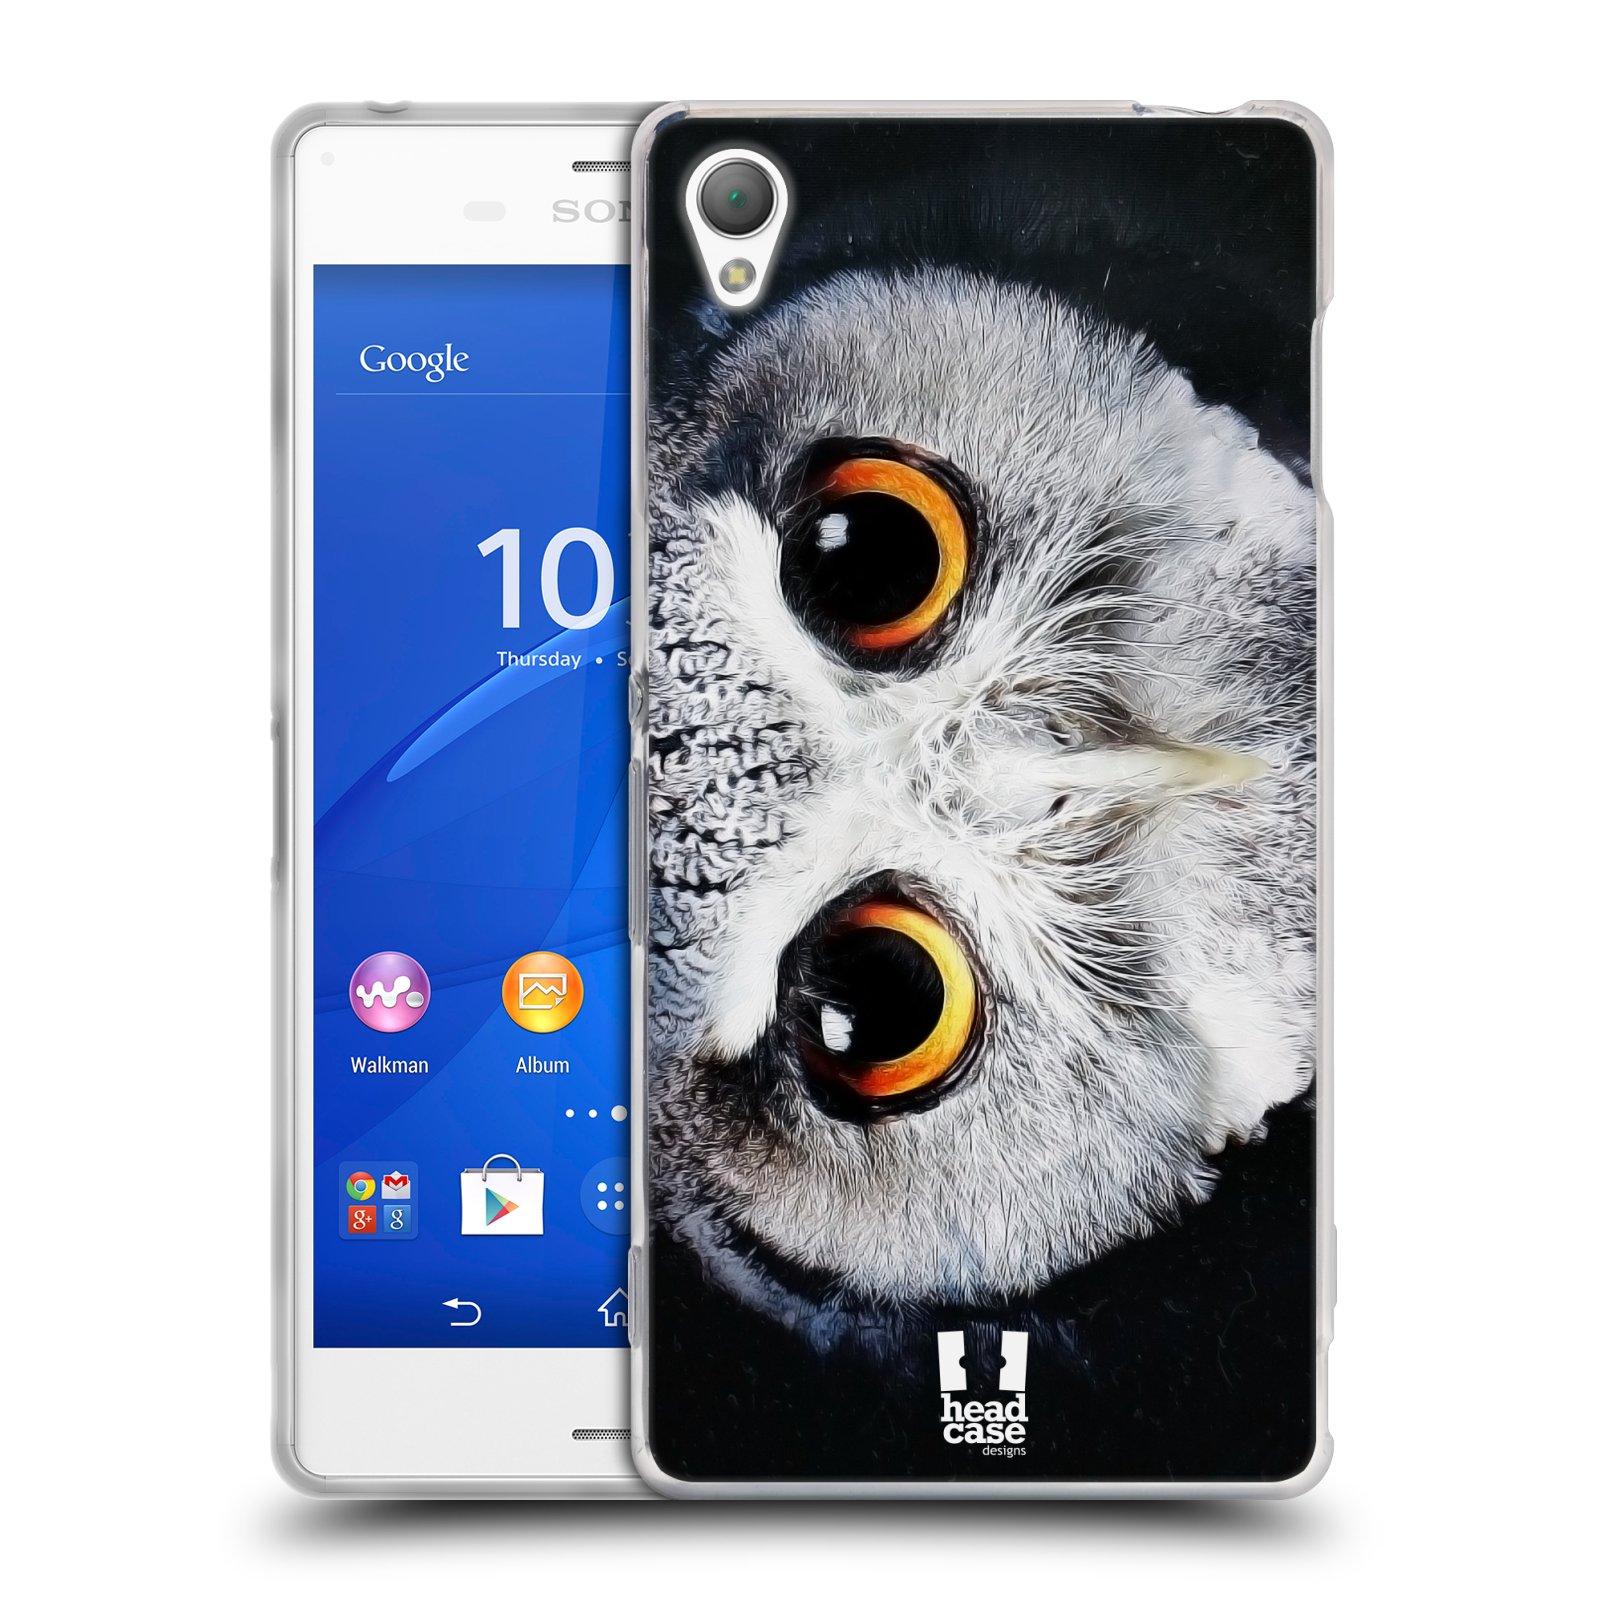 HEAD CASE silikonový obal na mobil Sony Xperia Z3 vzor Zvířecí tváře sova